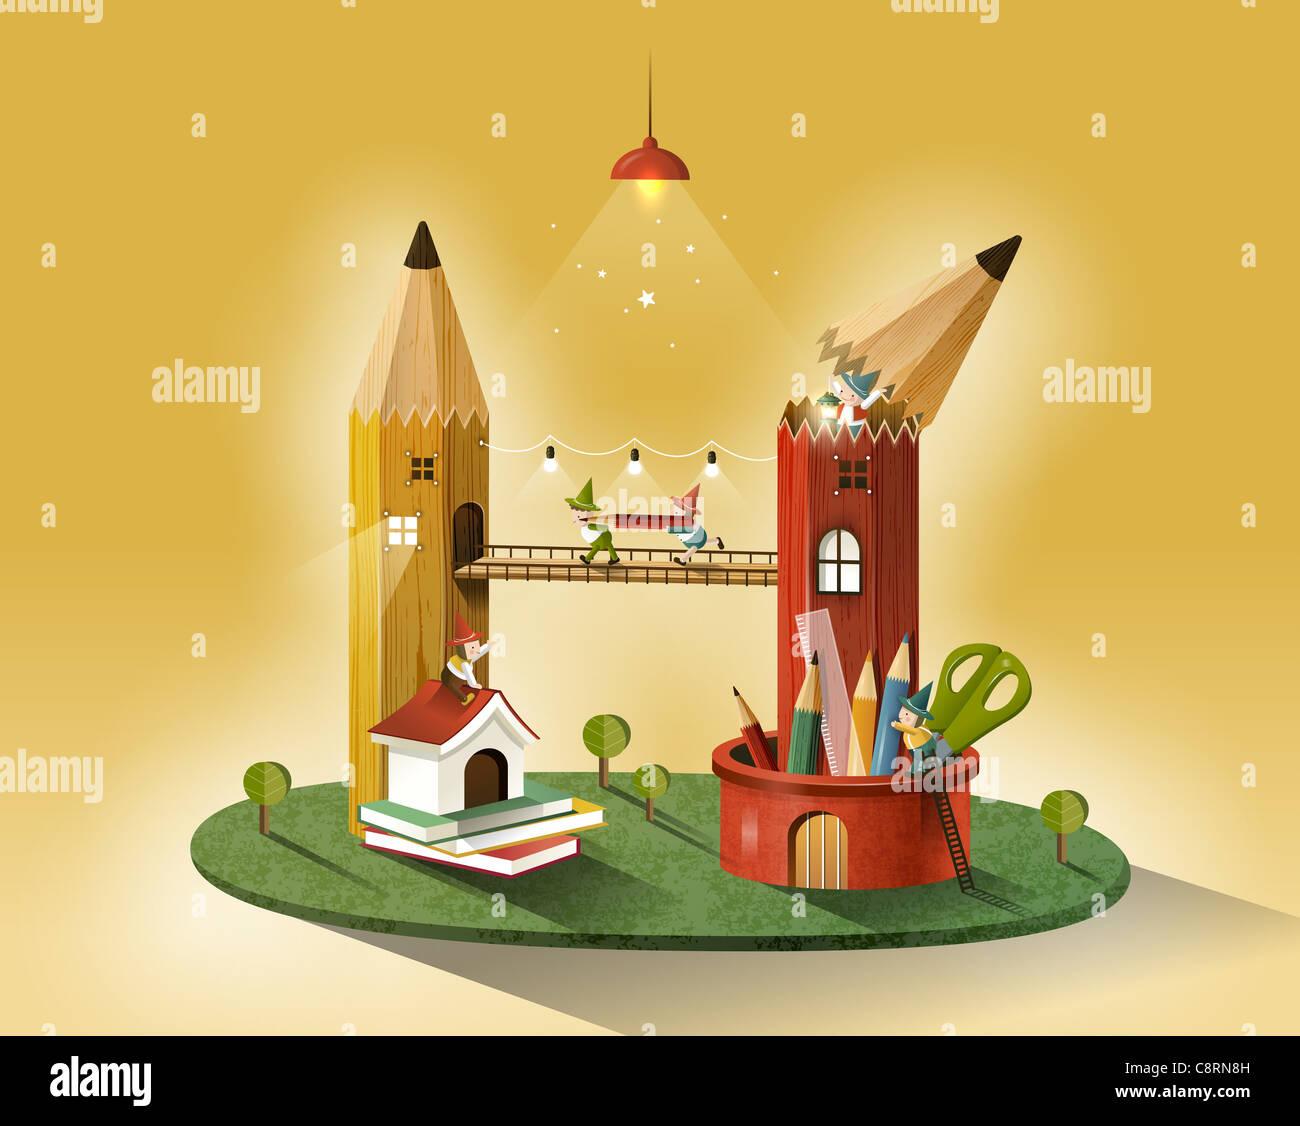 Pencil Bridge And Books - Stock Image